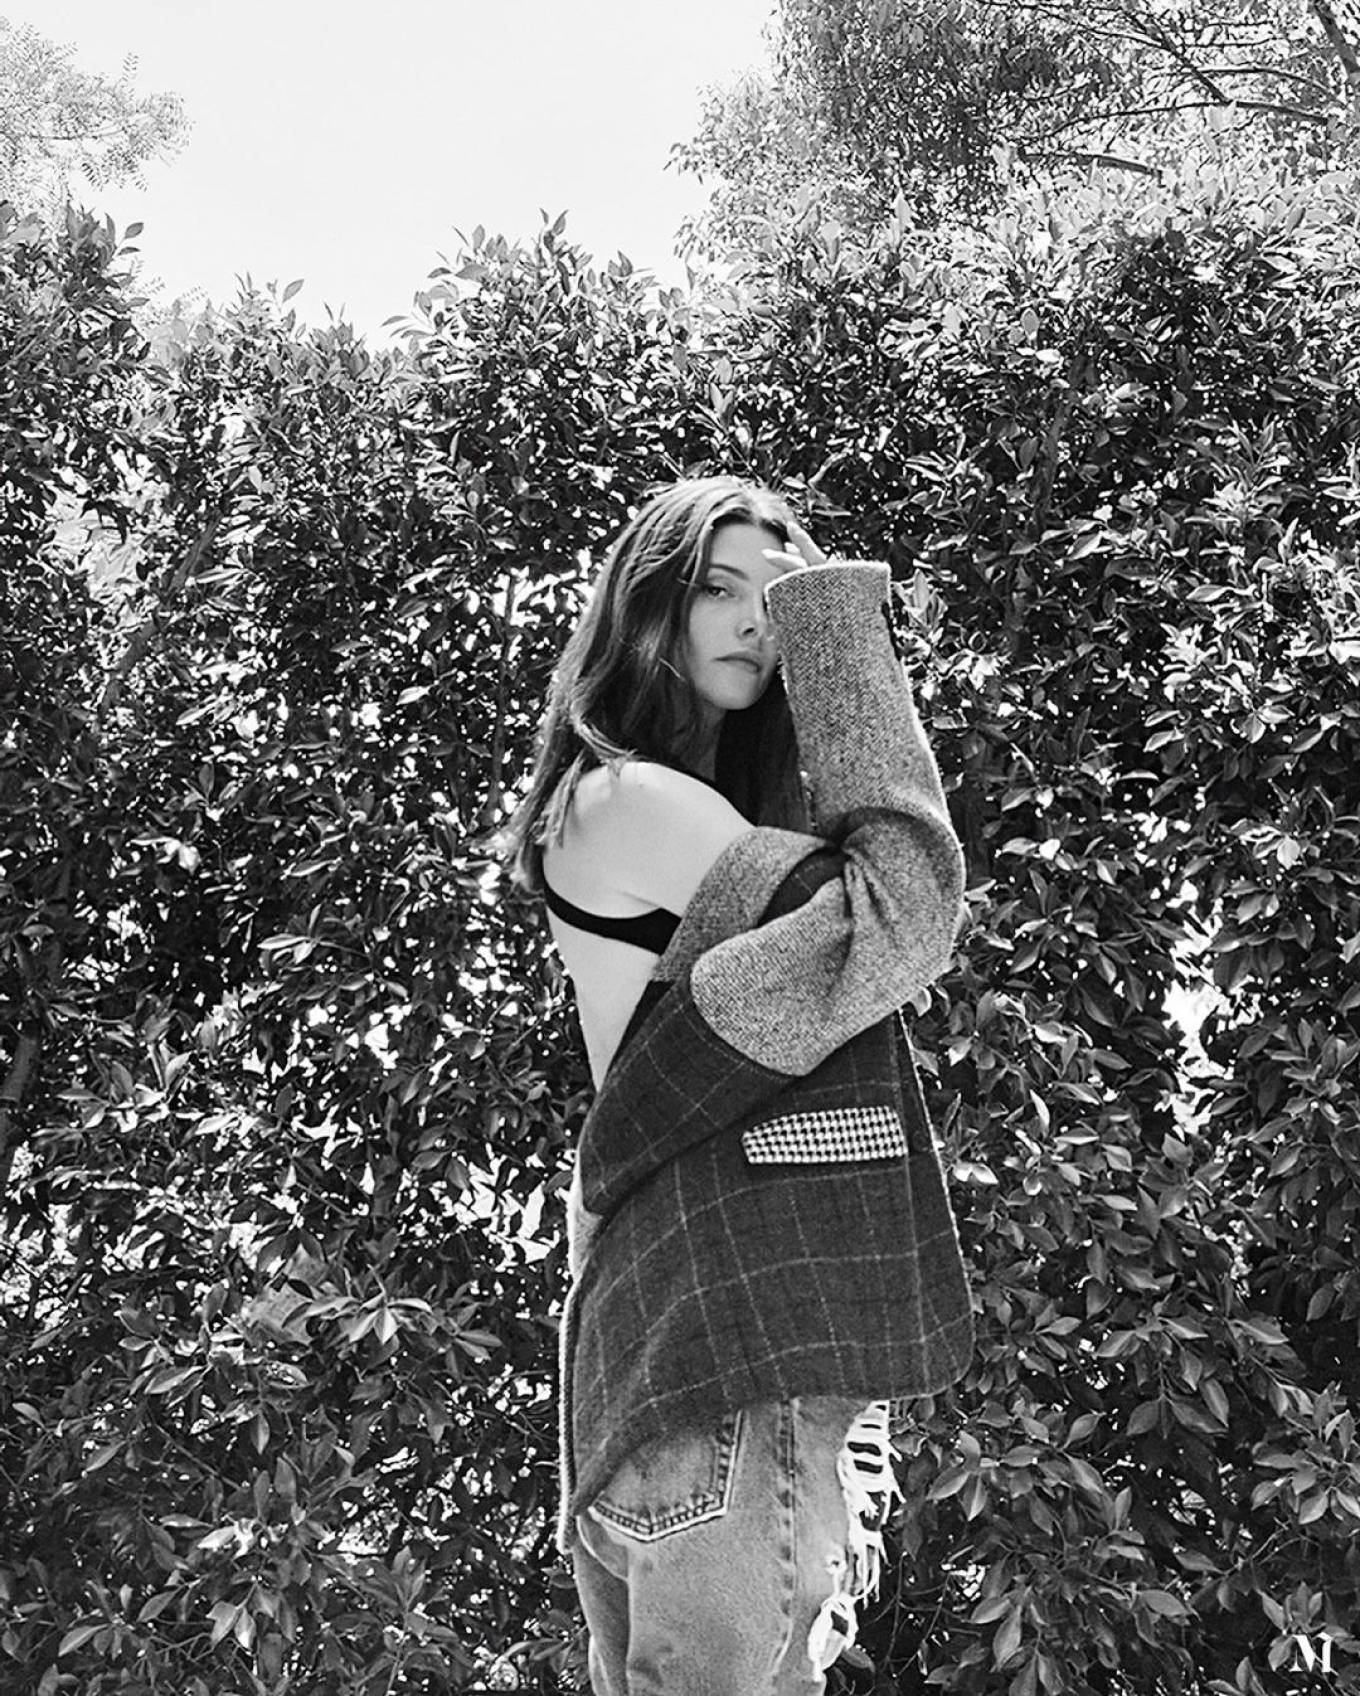 Ashley Greene 2020 : Ashley Greene – Revista de Milenio magazine (Issue 03 – 2020)-02